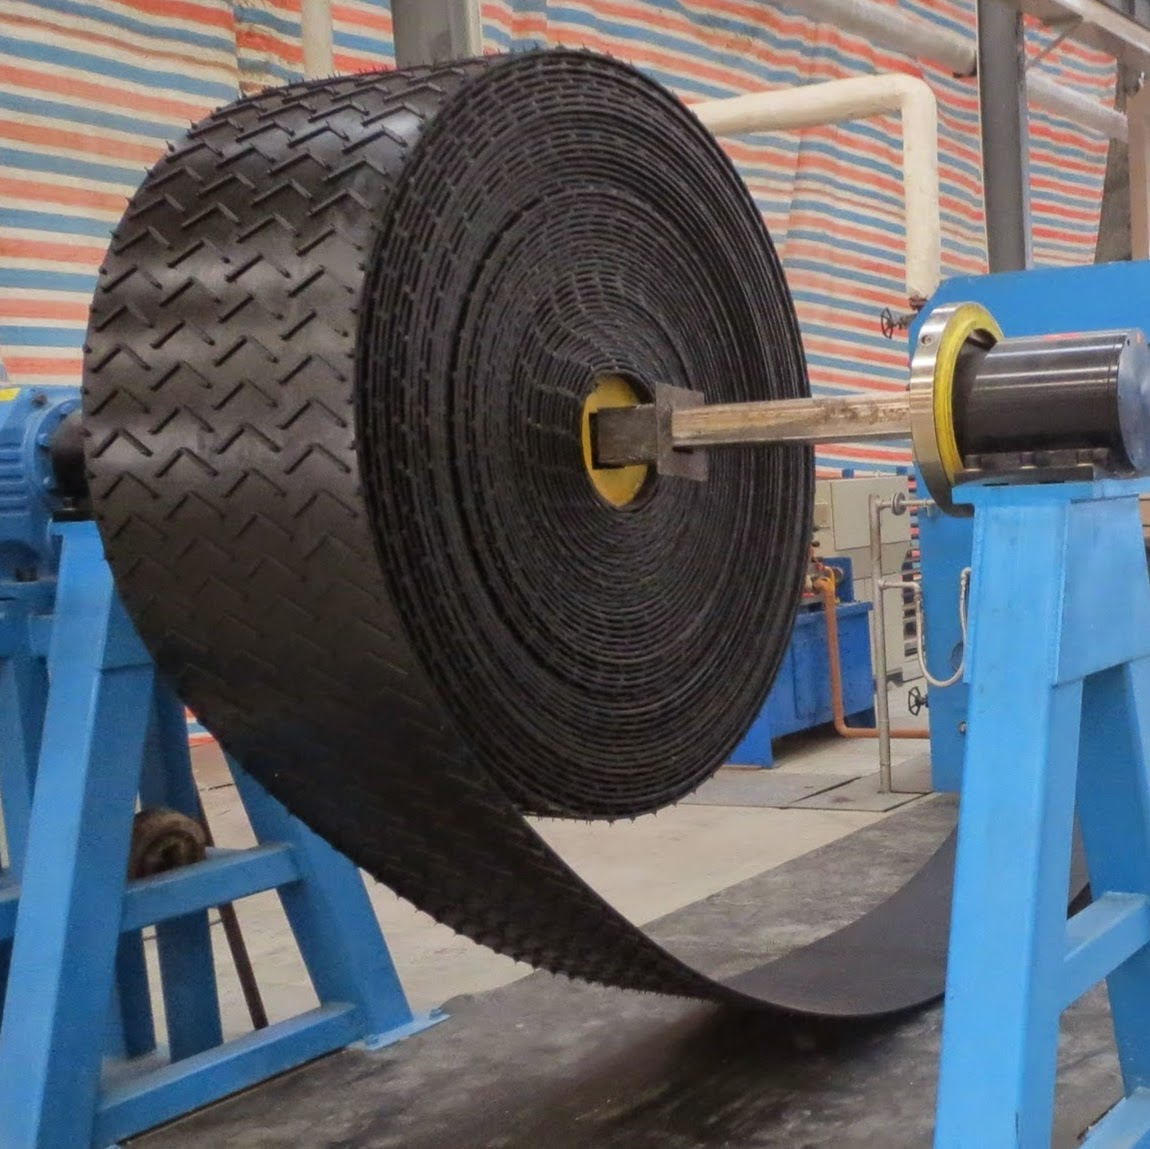 Gluing Epdm Rubber W I Polymers Ltd